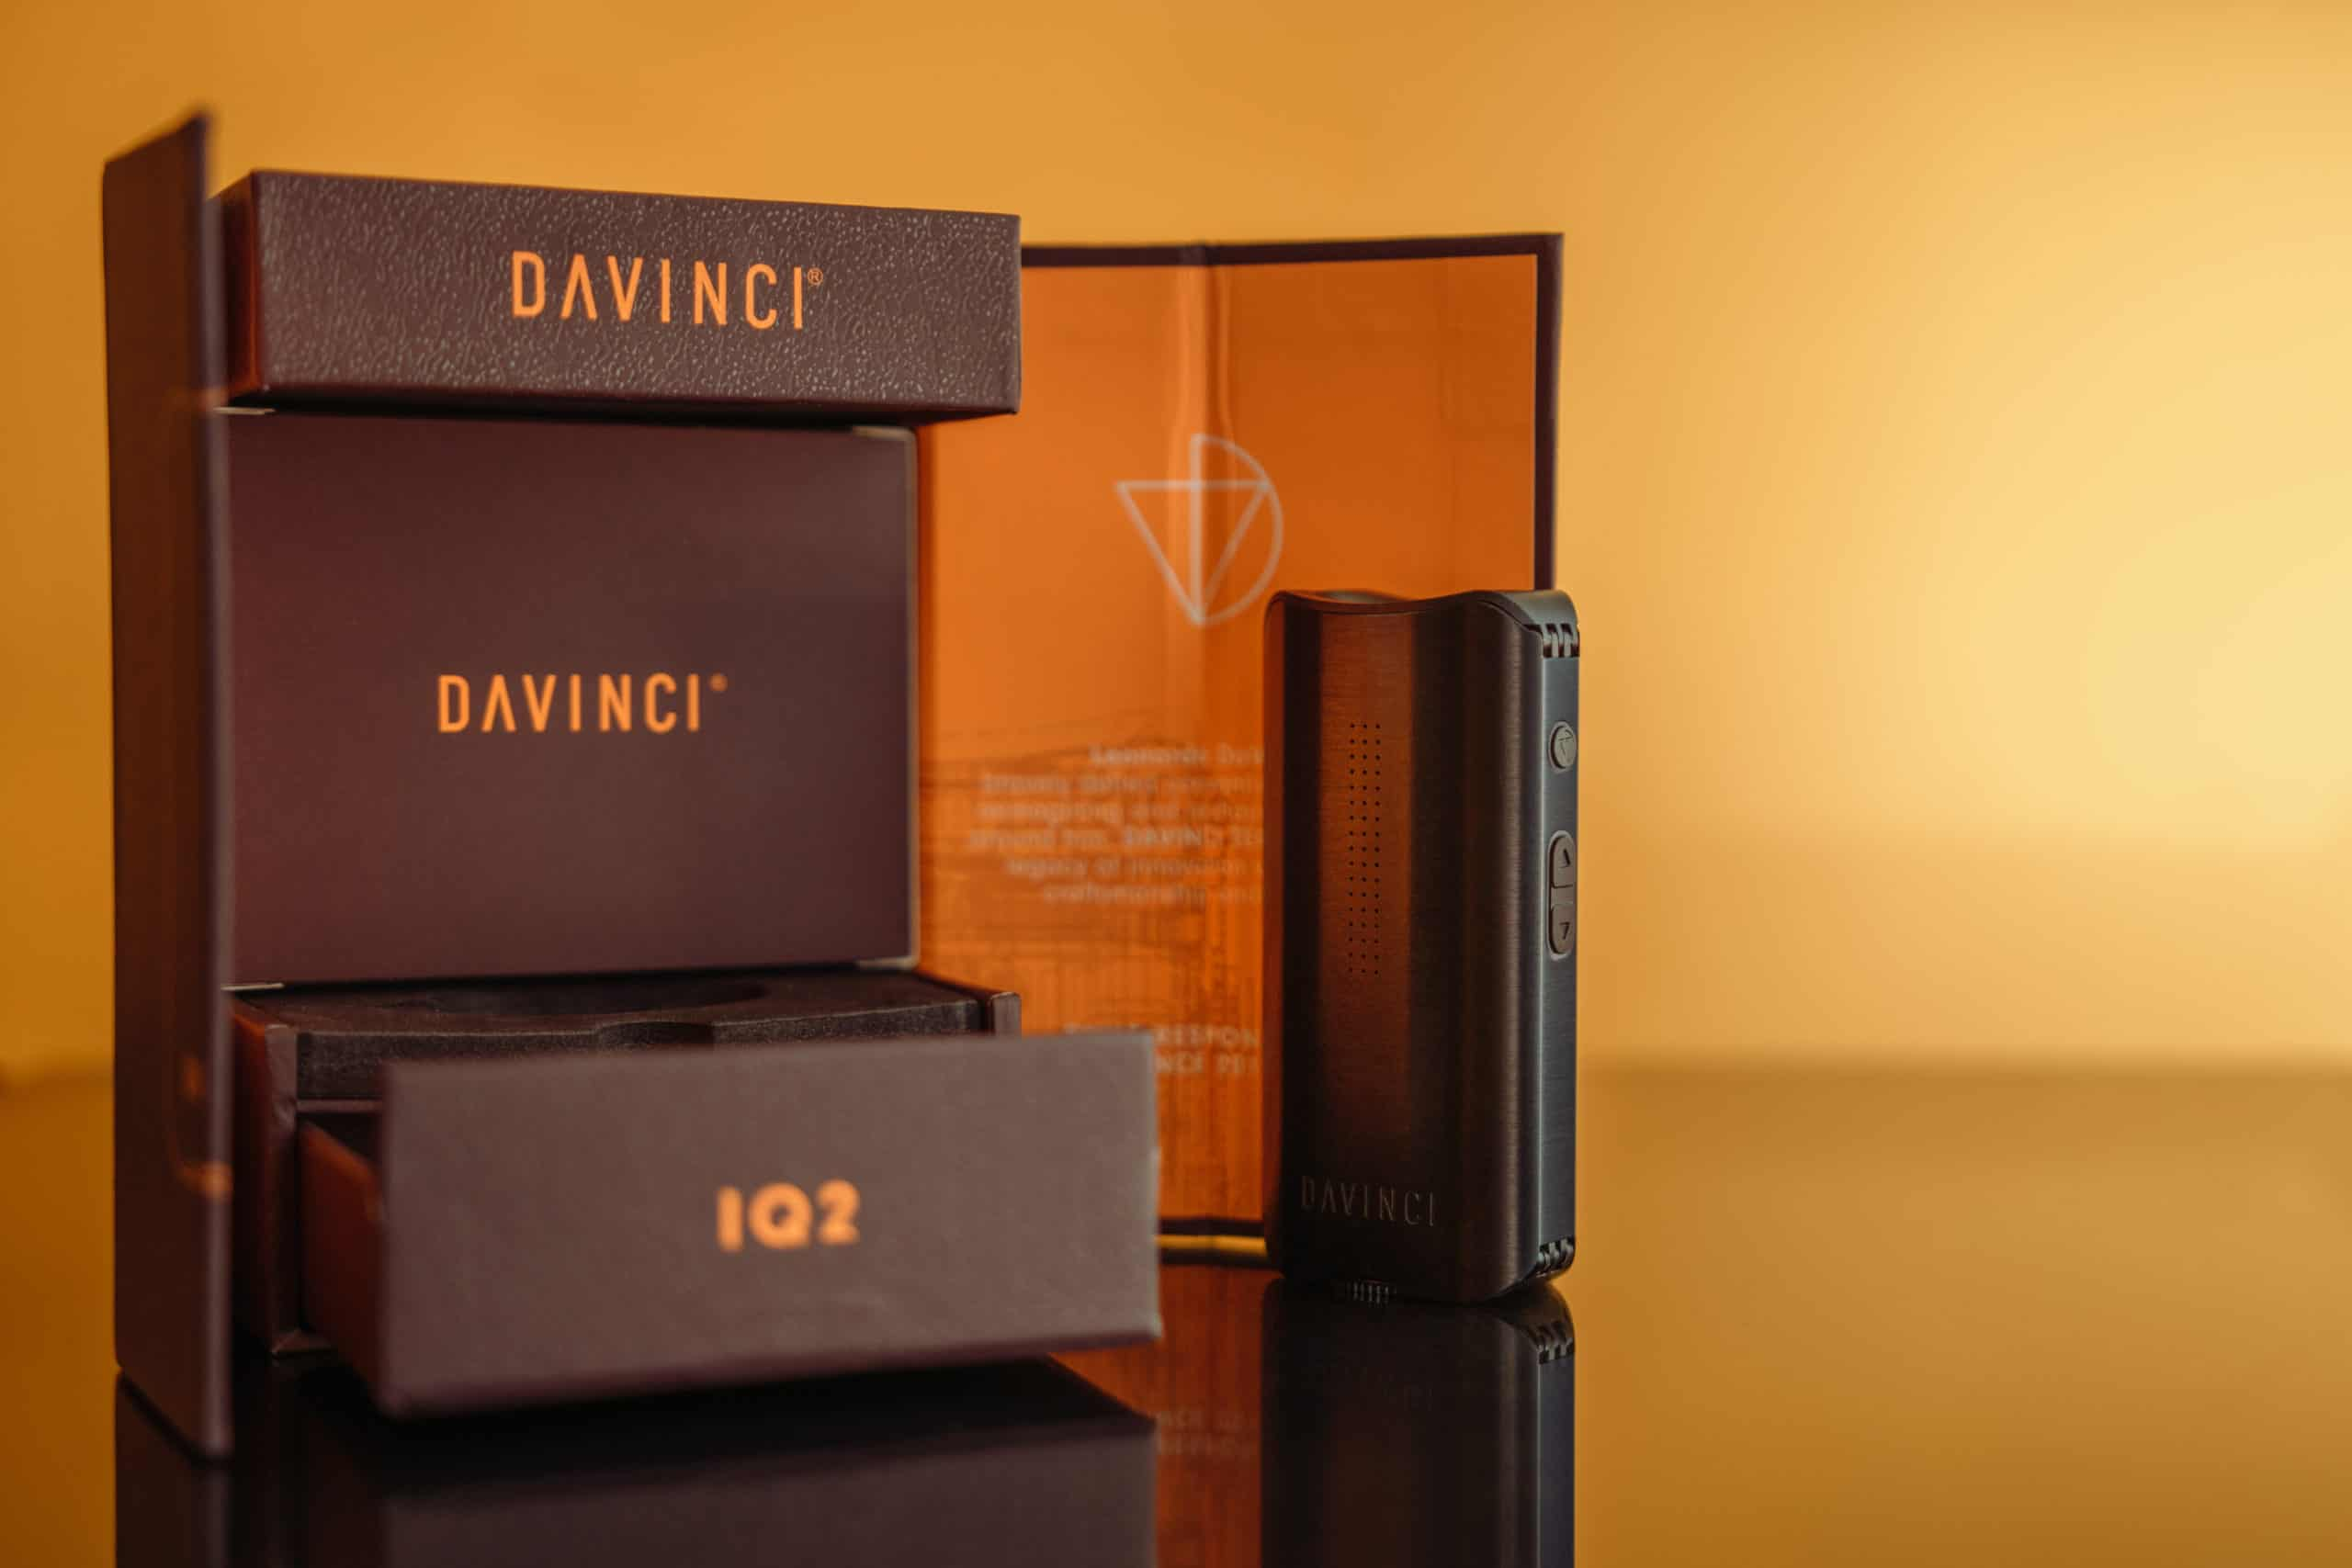 DaVinci IQ2 vaporizer